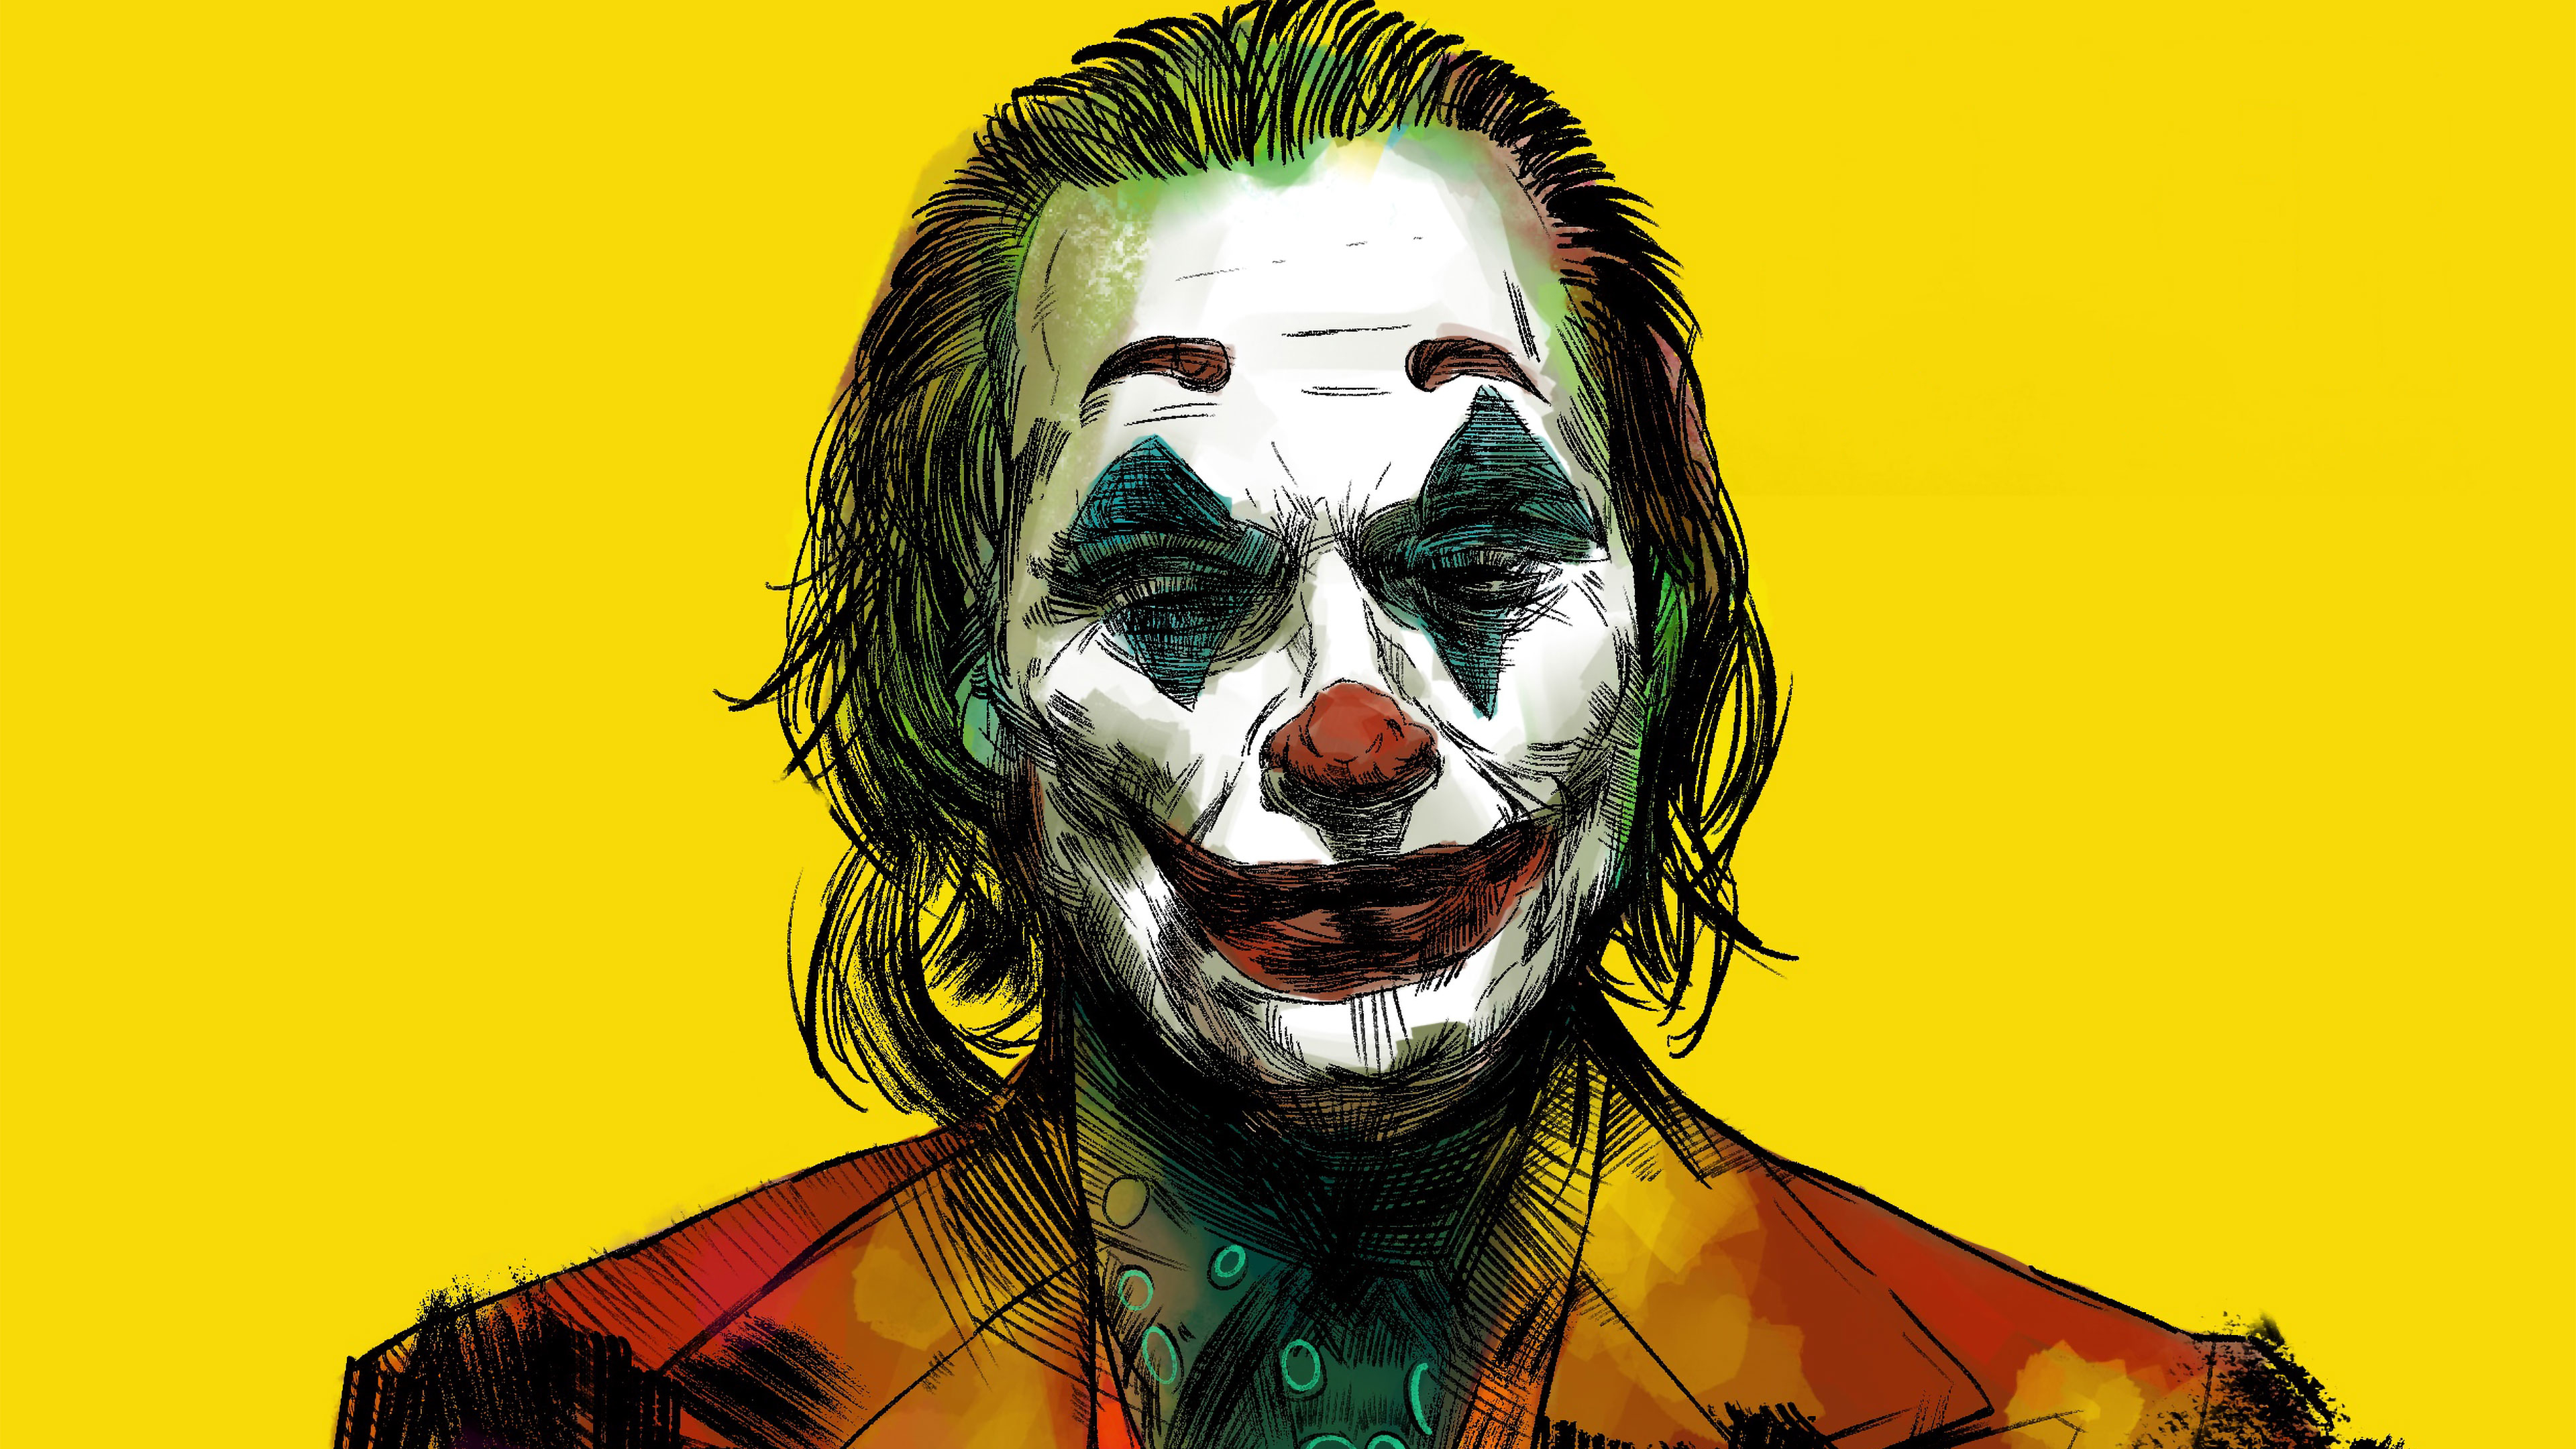 3840x2160 2019 Joker Movie 4k 4K Wallpaper, HD Movies 4K ...